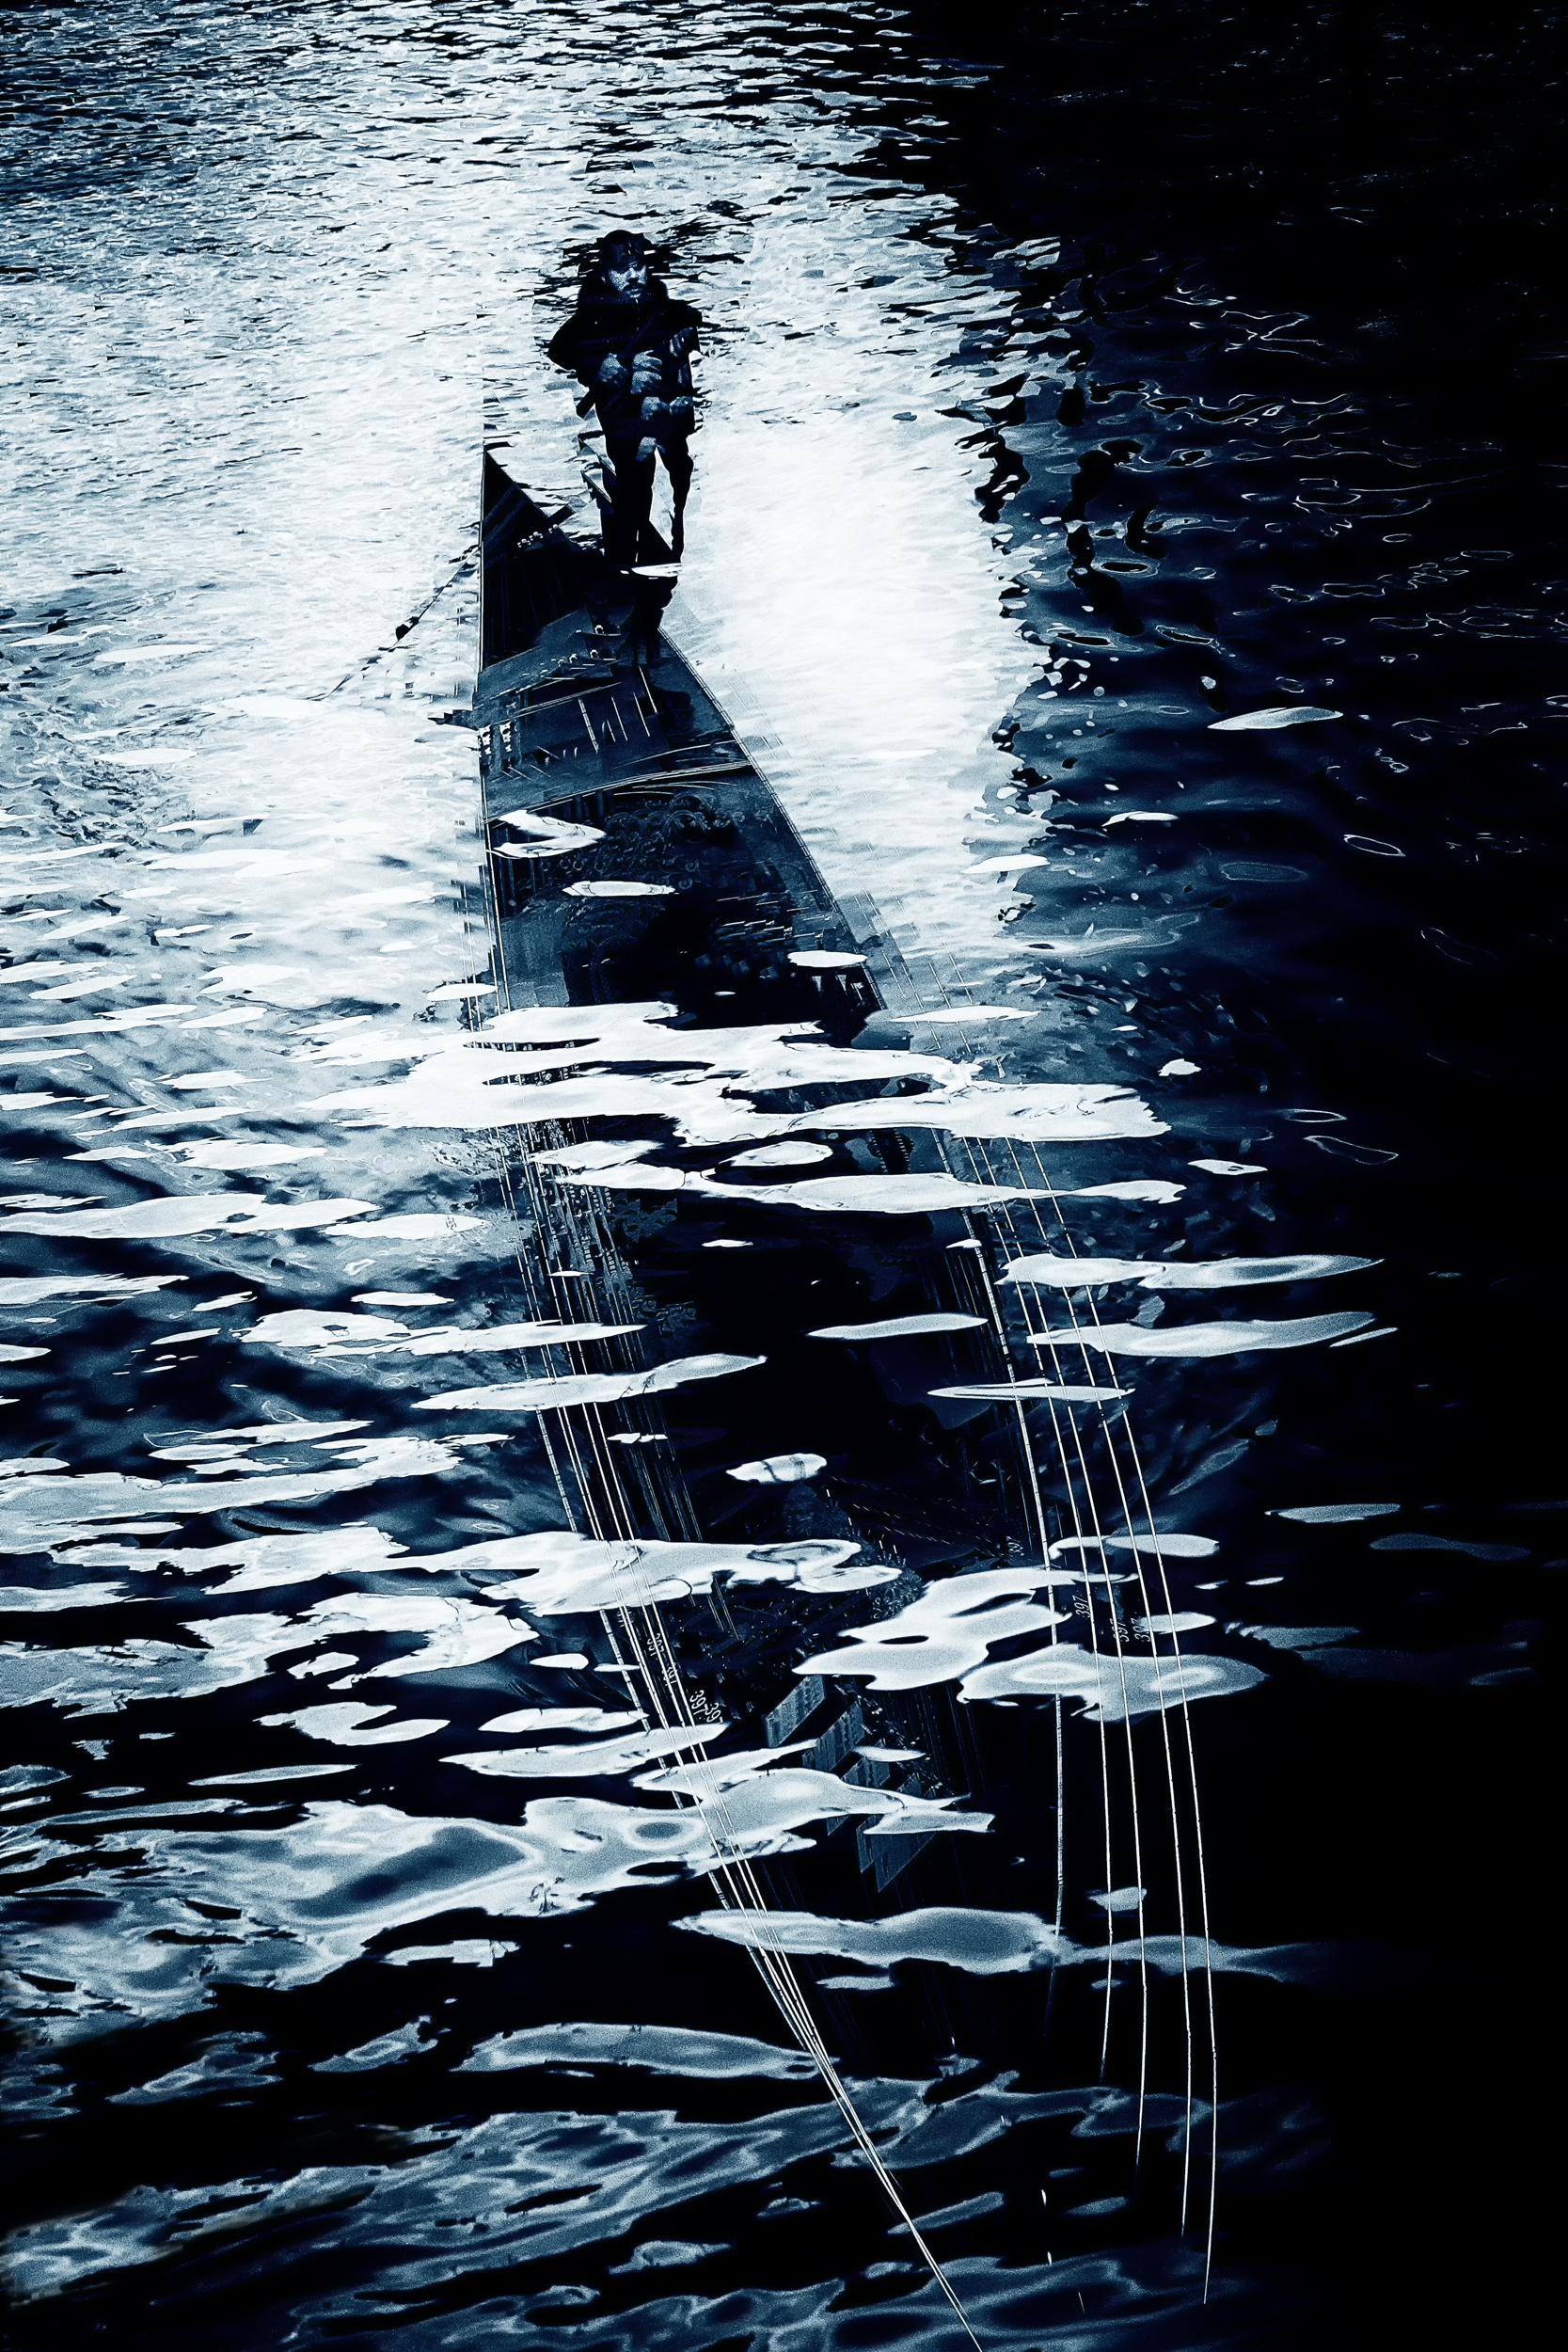 Submarine Gondola. Gondola sotto le onde.